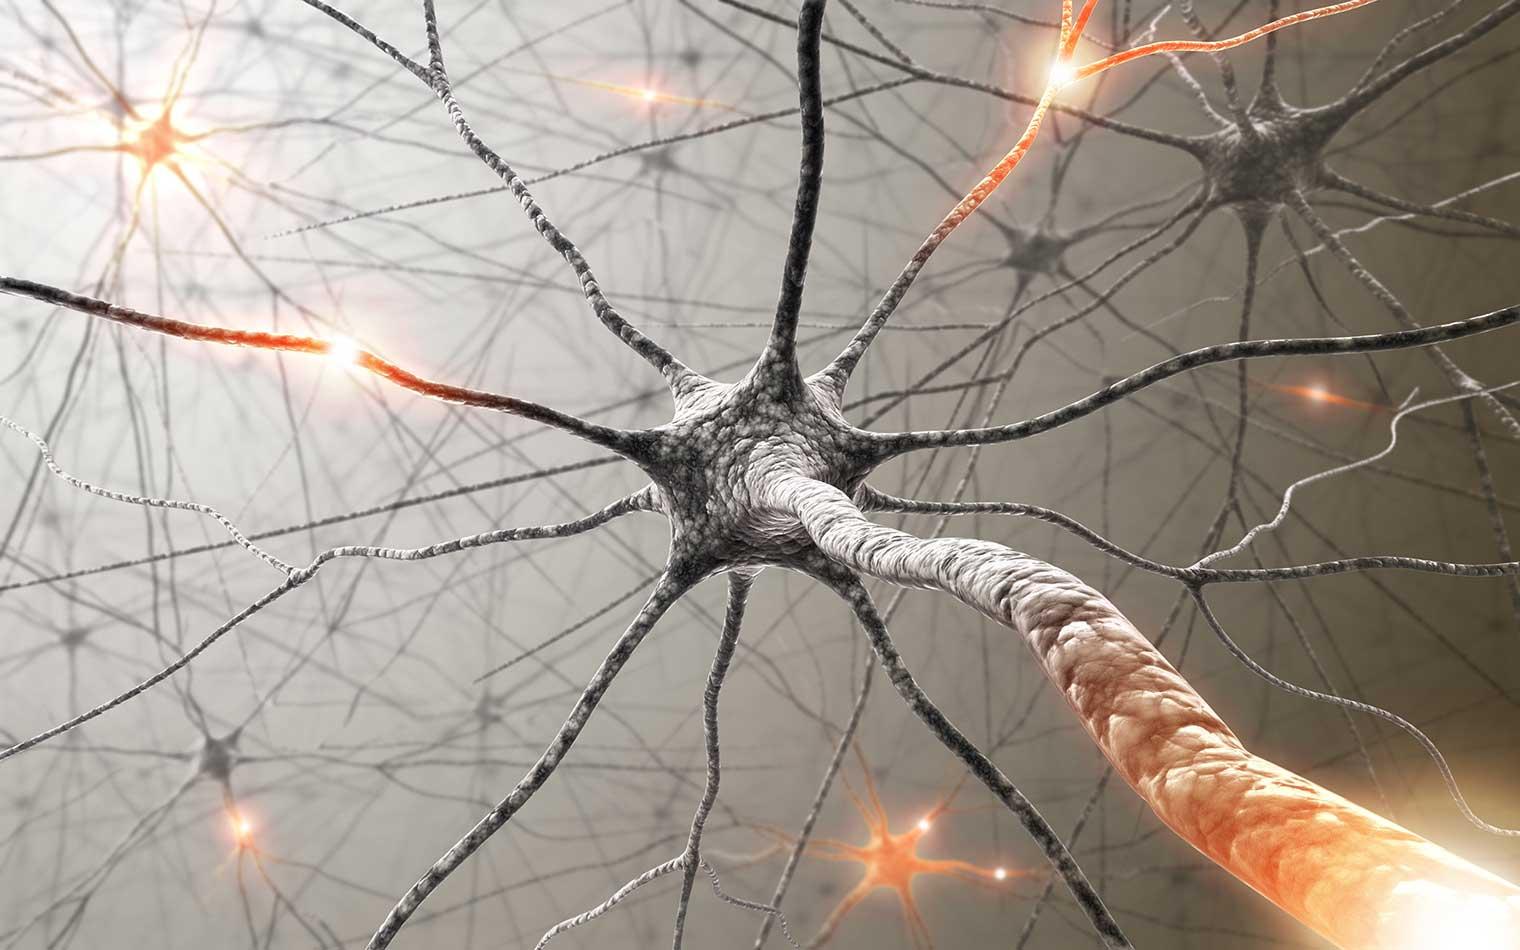 TRE Tremors Trauma Release stimulates the nerve endings, Kate Munden